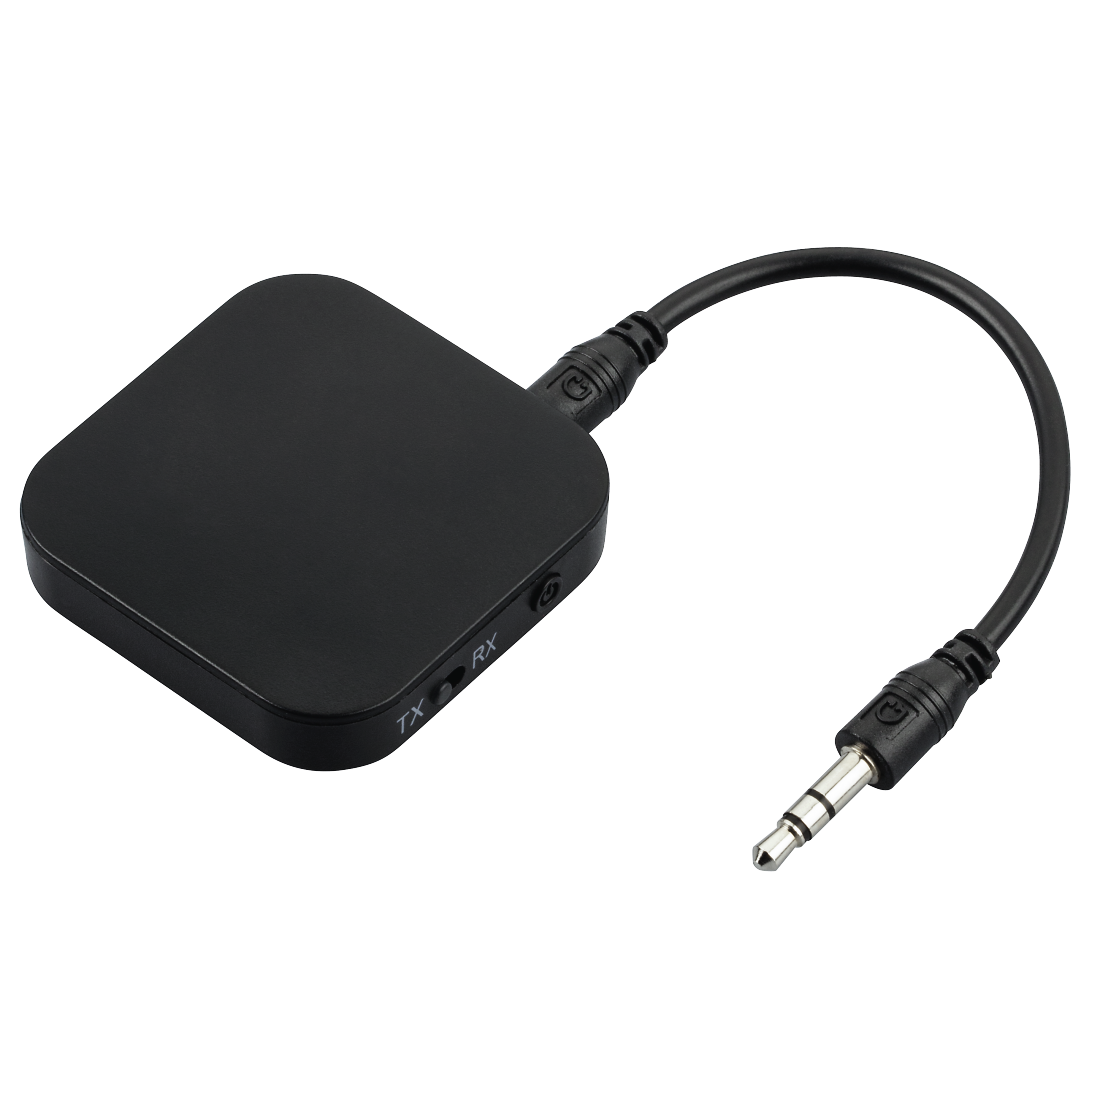 DRIVER FOR HAMA BLUETOOTH BT-USB ADAPTER CLASS 2